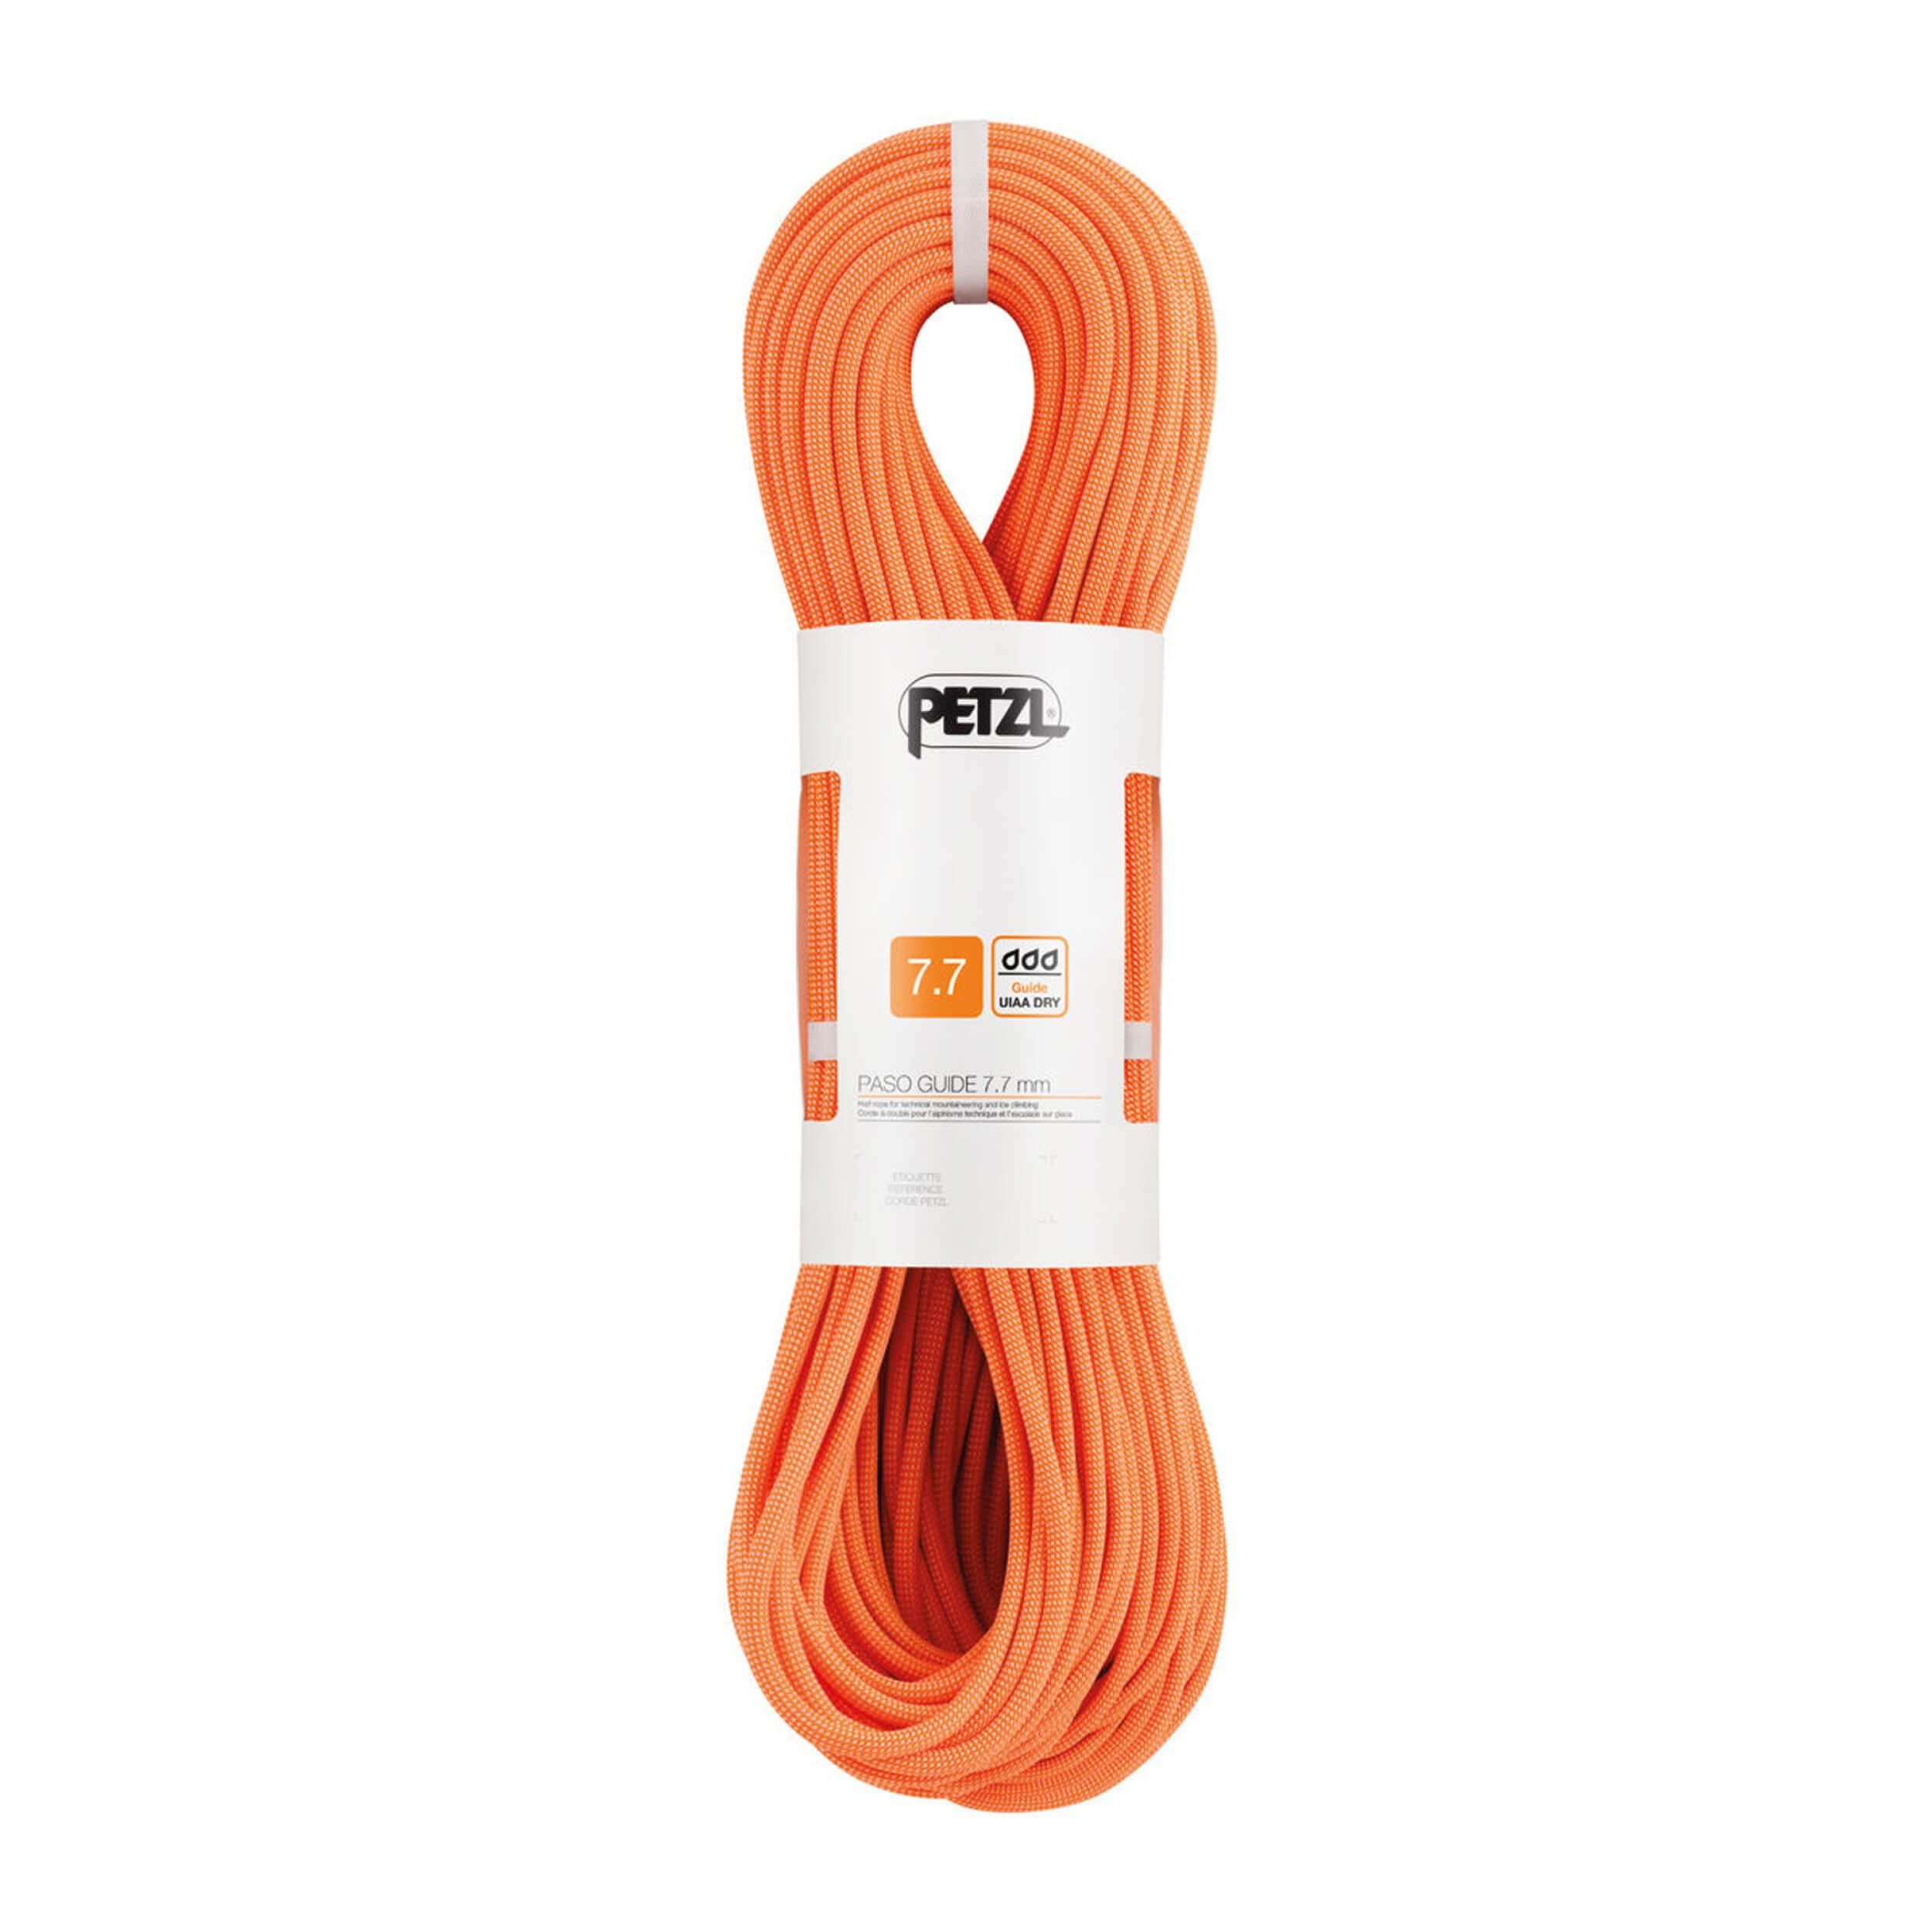 Petzl PASO GUIDE 7,7mm x 50m Seil